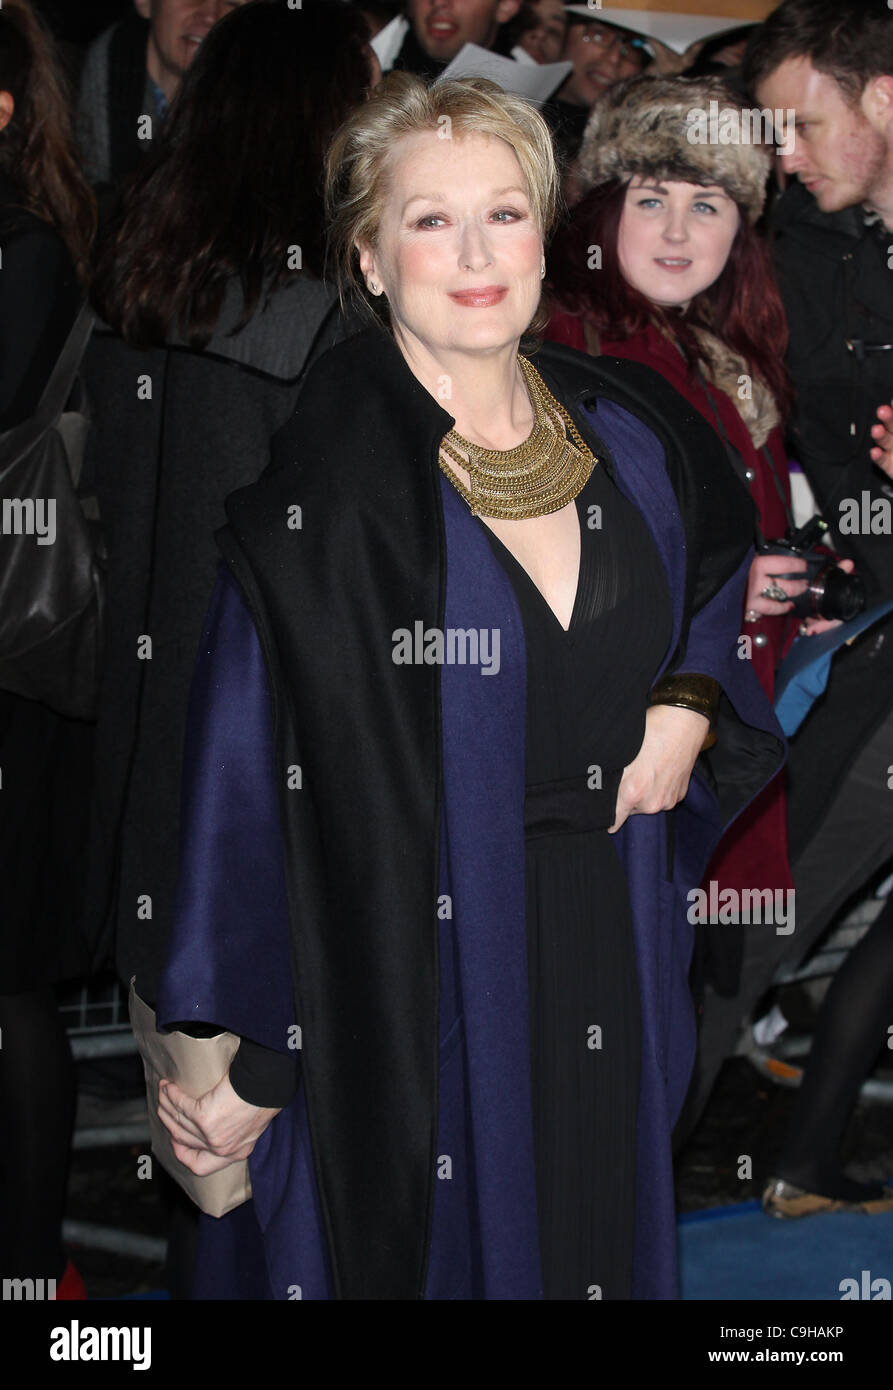 London, UK, 01.04.2012 Meryl Streep besucht die eiserne Lady - UK-Film-Premiere am BFI Southbank, London. Stockbild